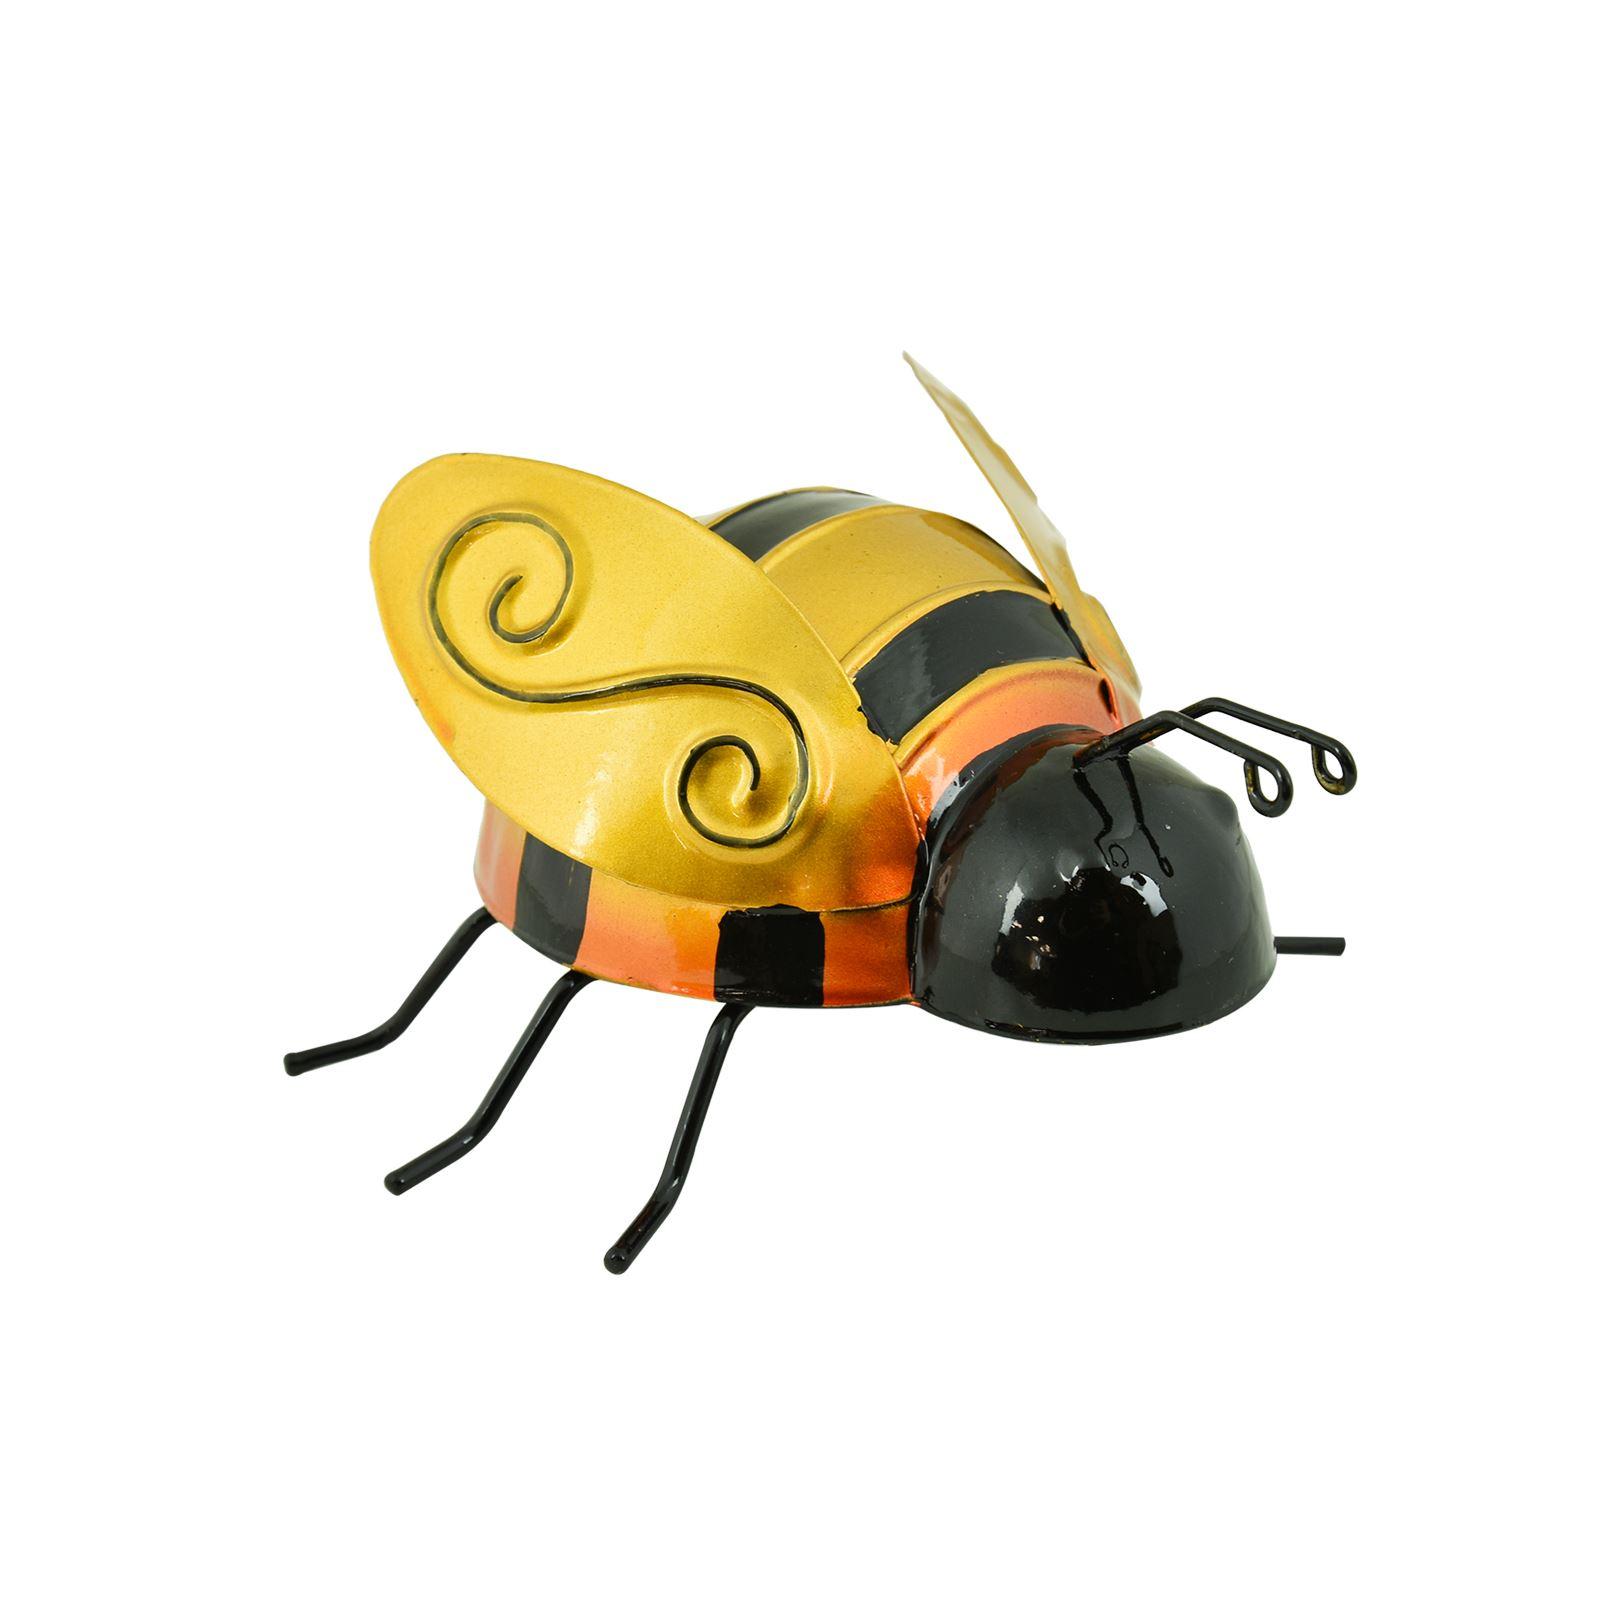 Metal Insect Garden Statues Ornament Bee Ladybird Bug Outdoor Wall ...